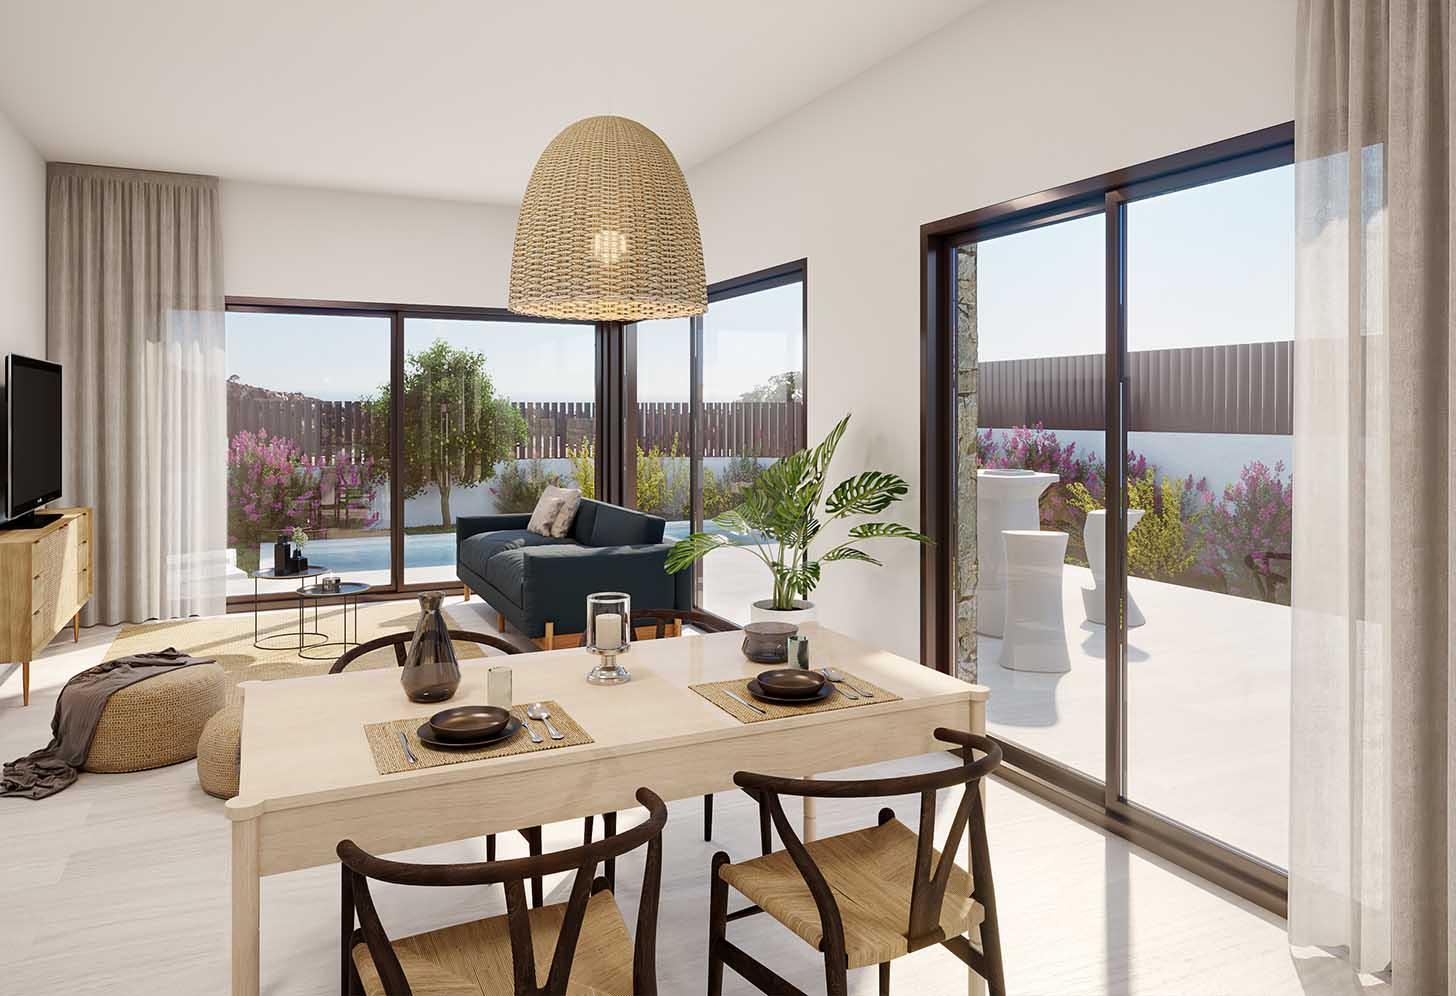 immobilier neuf espagne costa blanca on-o2 balcon finestrat salon